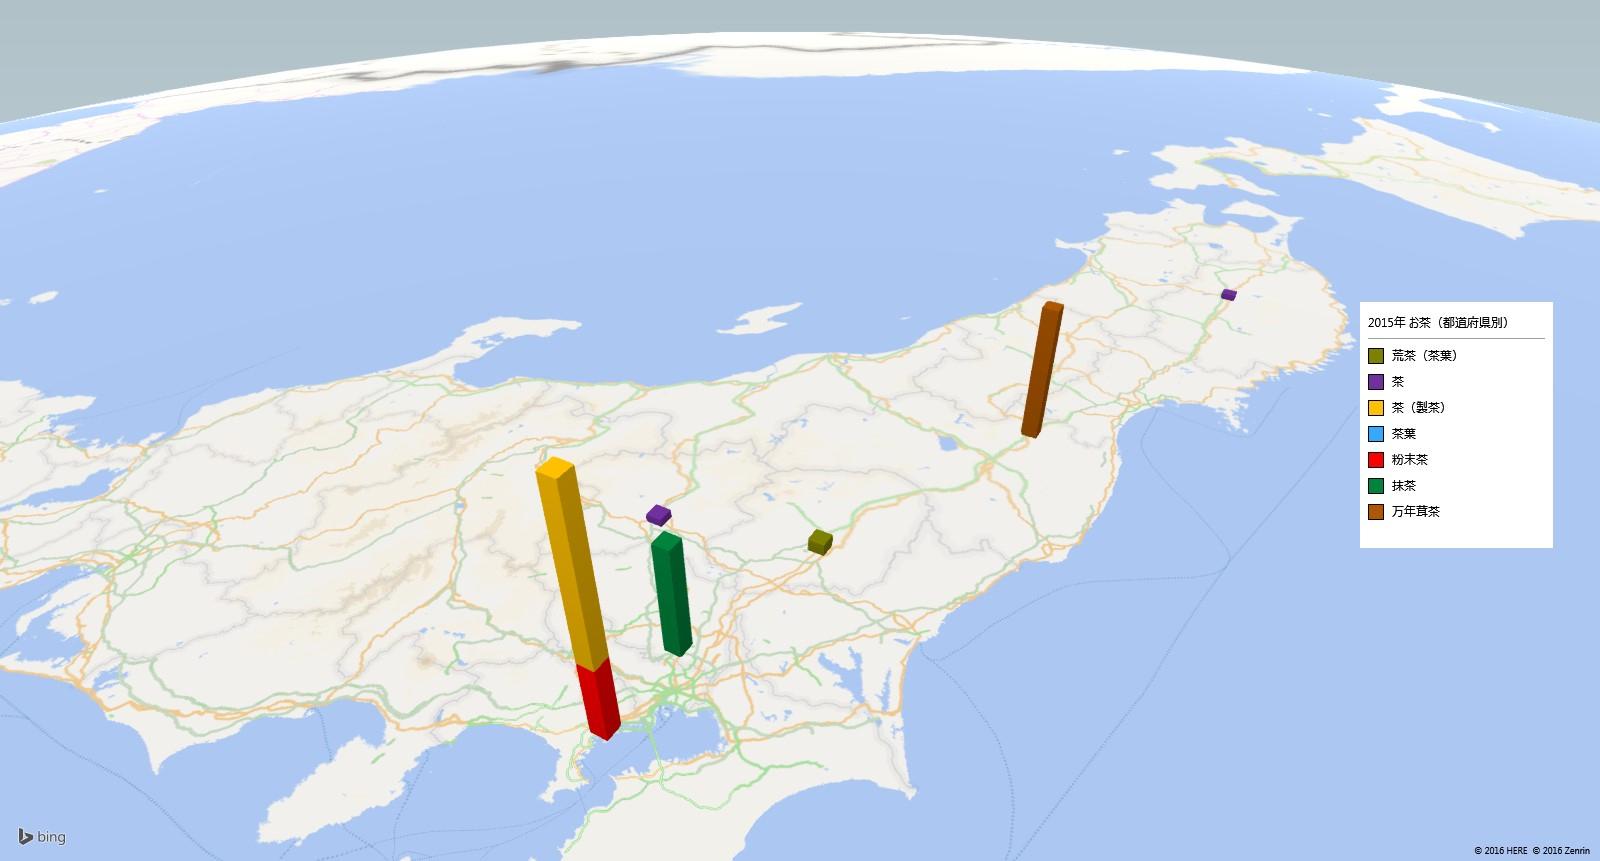 お茶類の放射能検査地図(都道府県別)